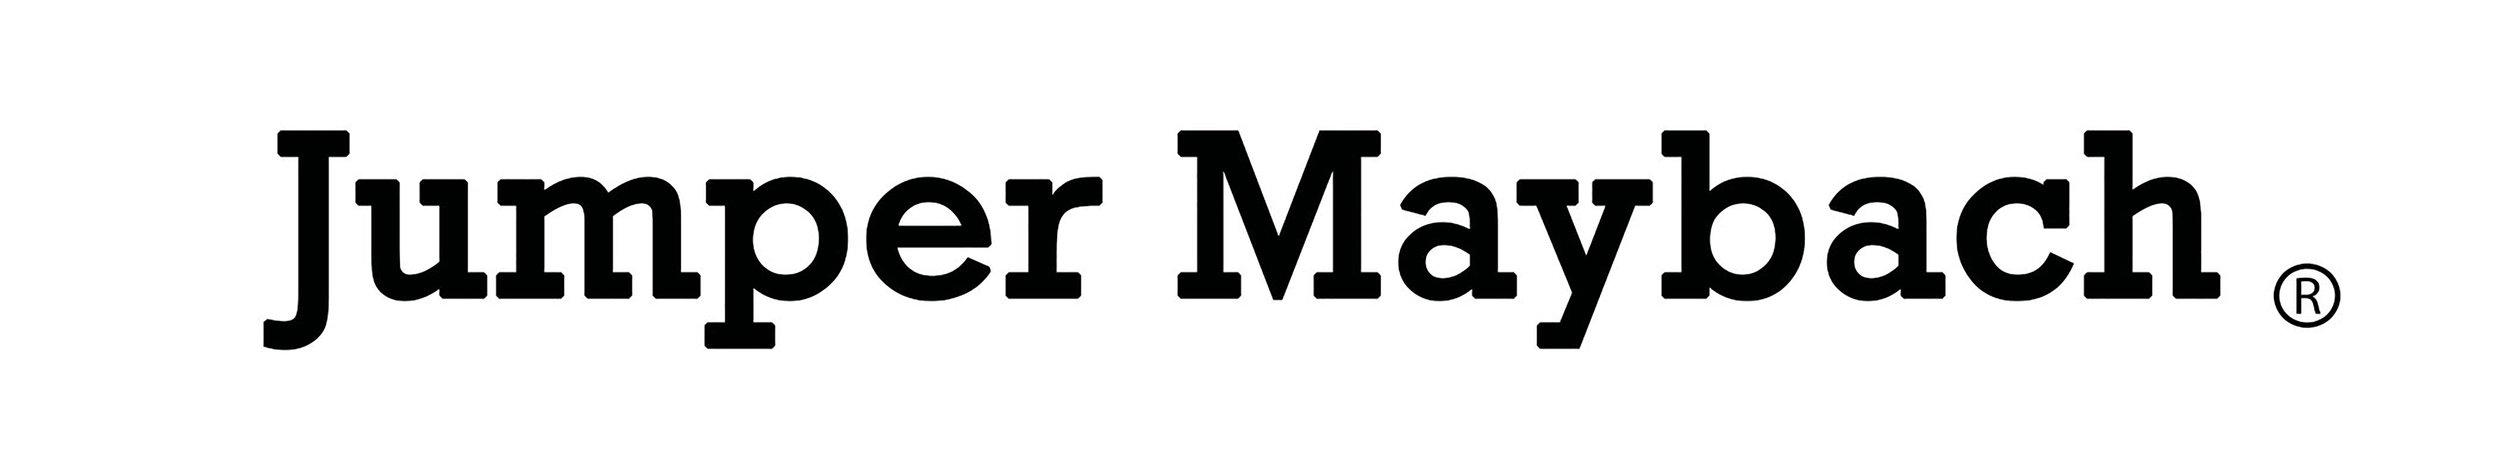 JM logo_enlarged.jpg